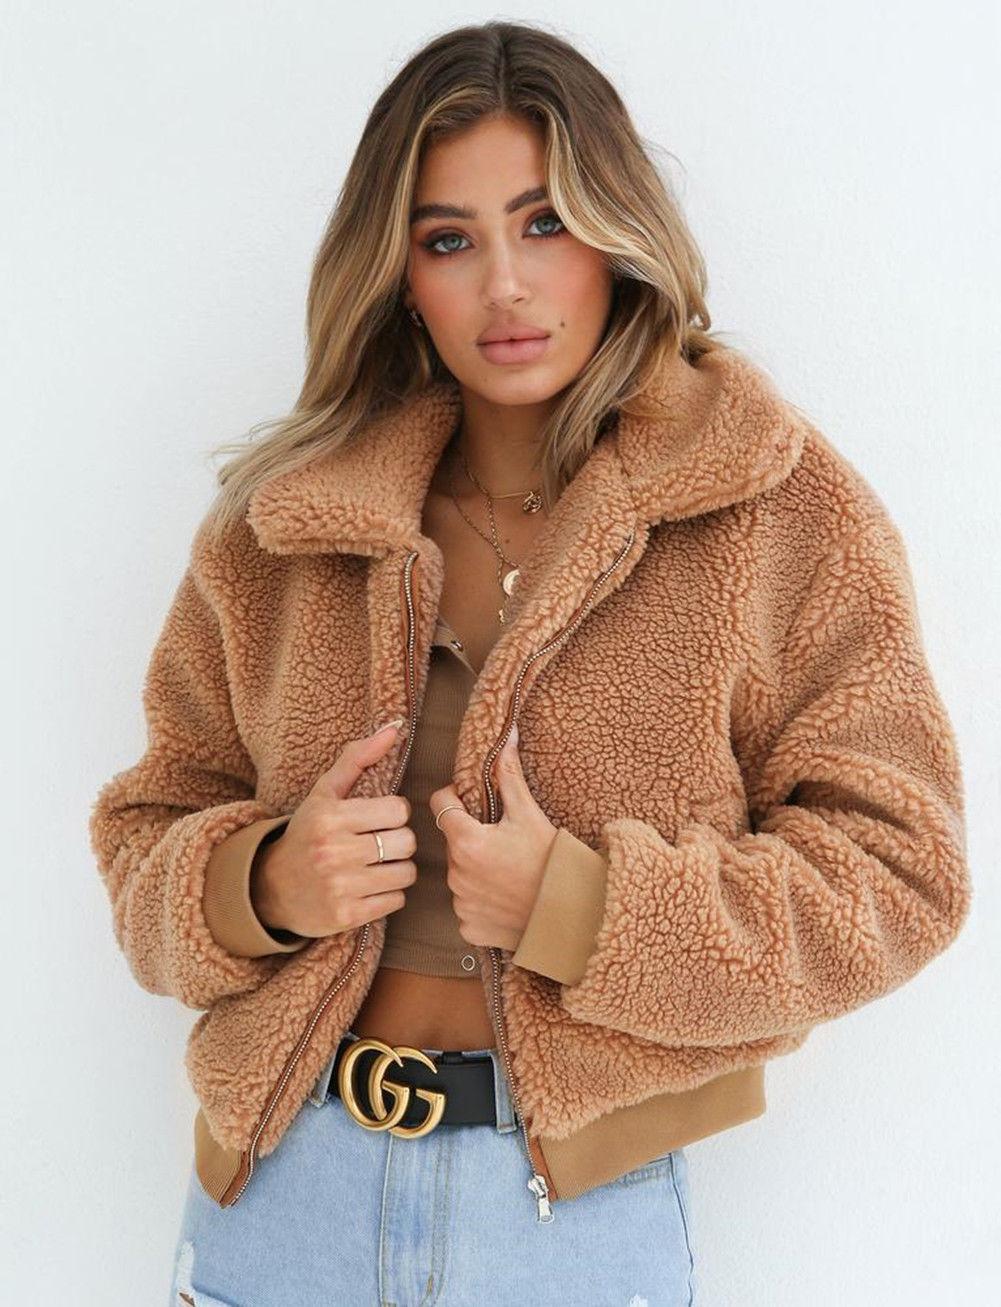 2019 Winter Arrival Women Cotton Fluffy Long Sleeve Jacket Ladies Warm Outerwear Cardigan Coat